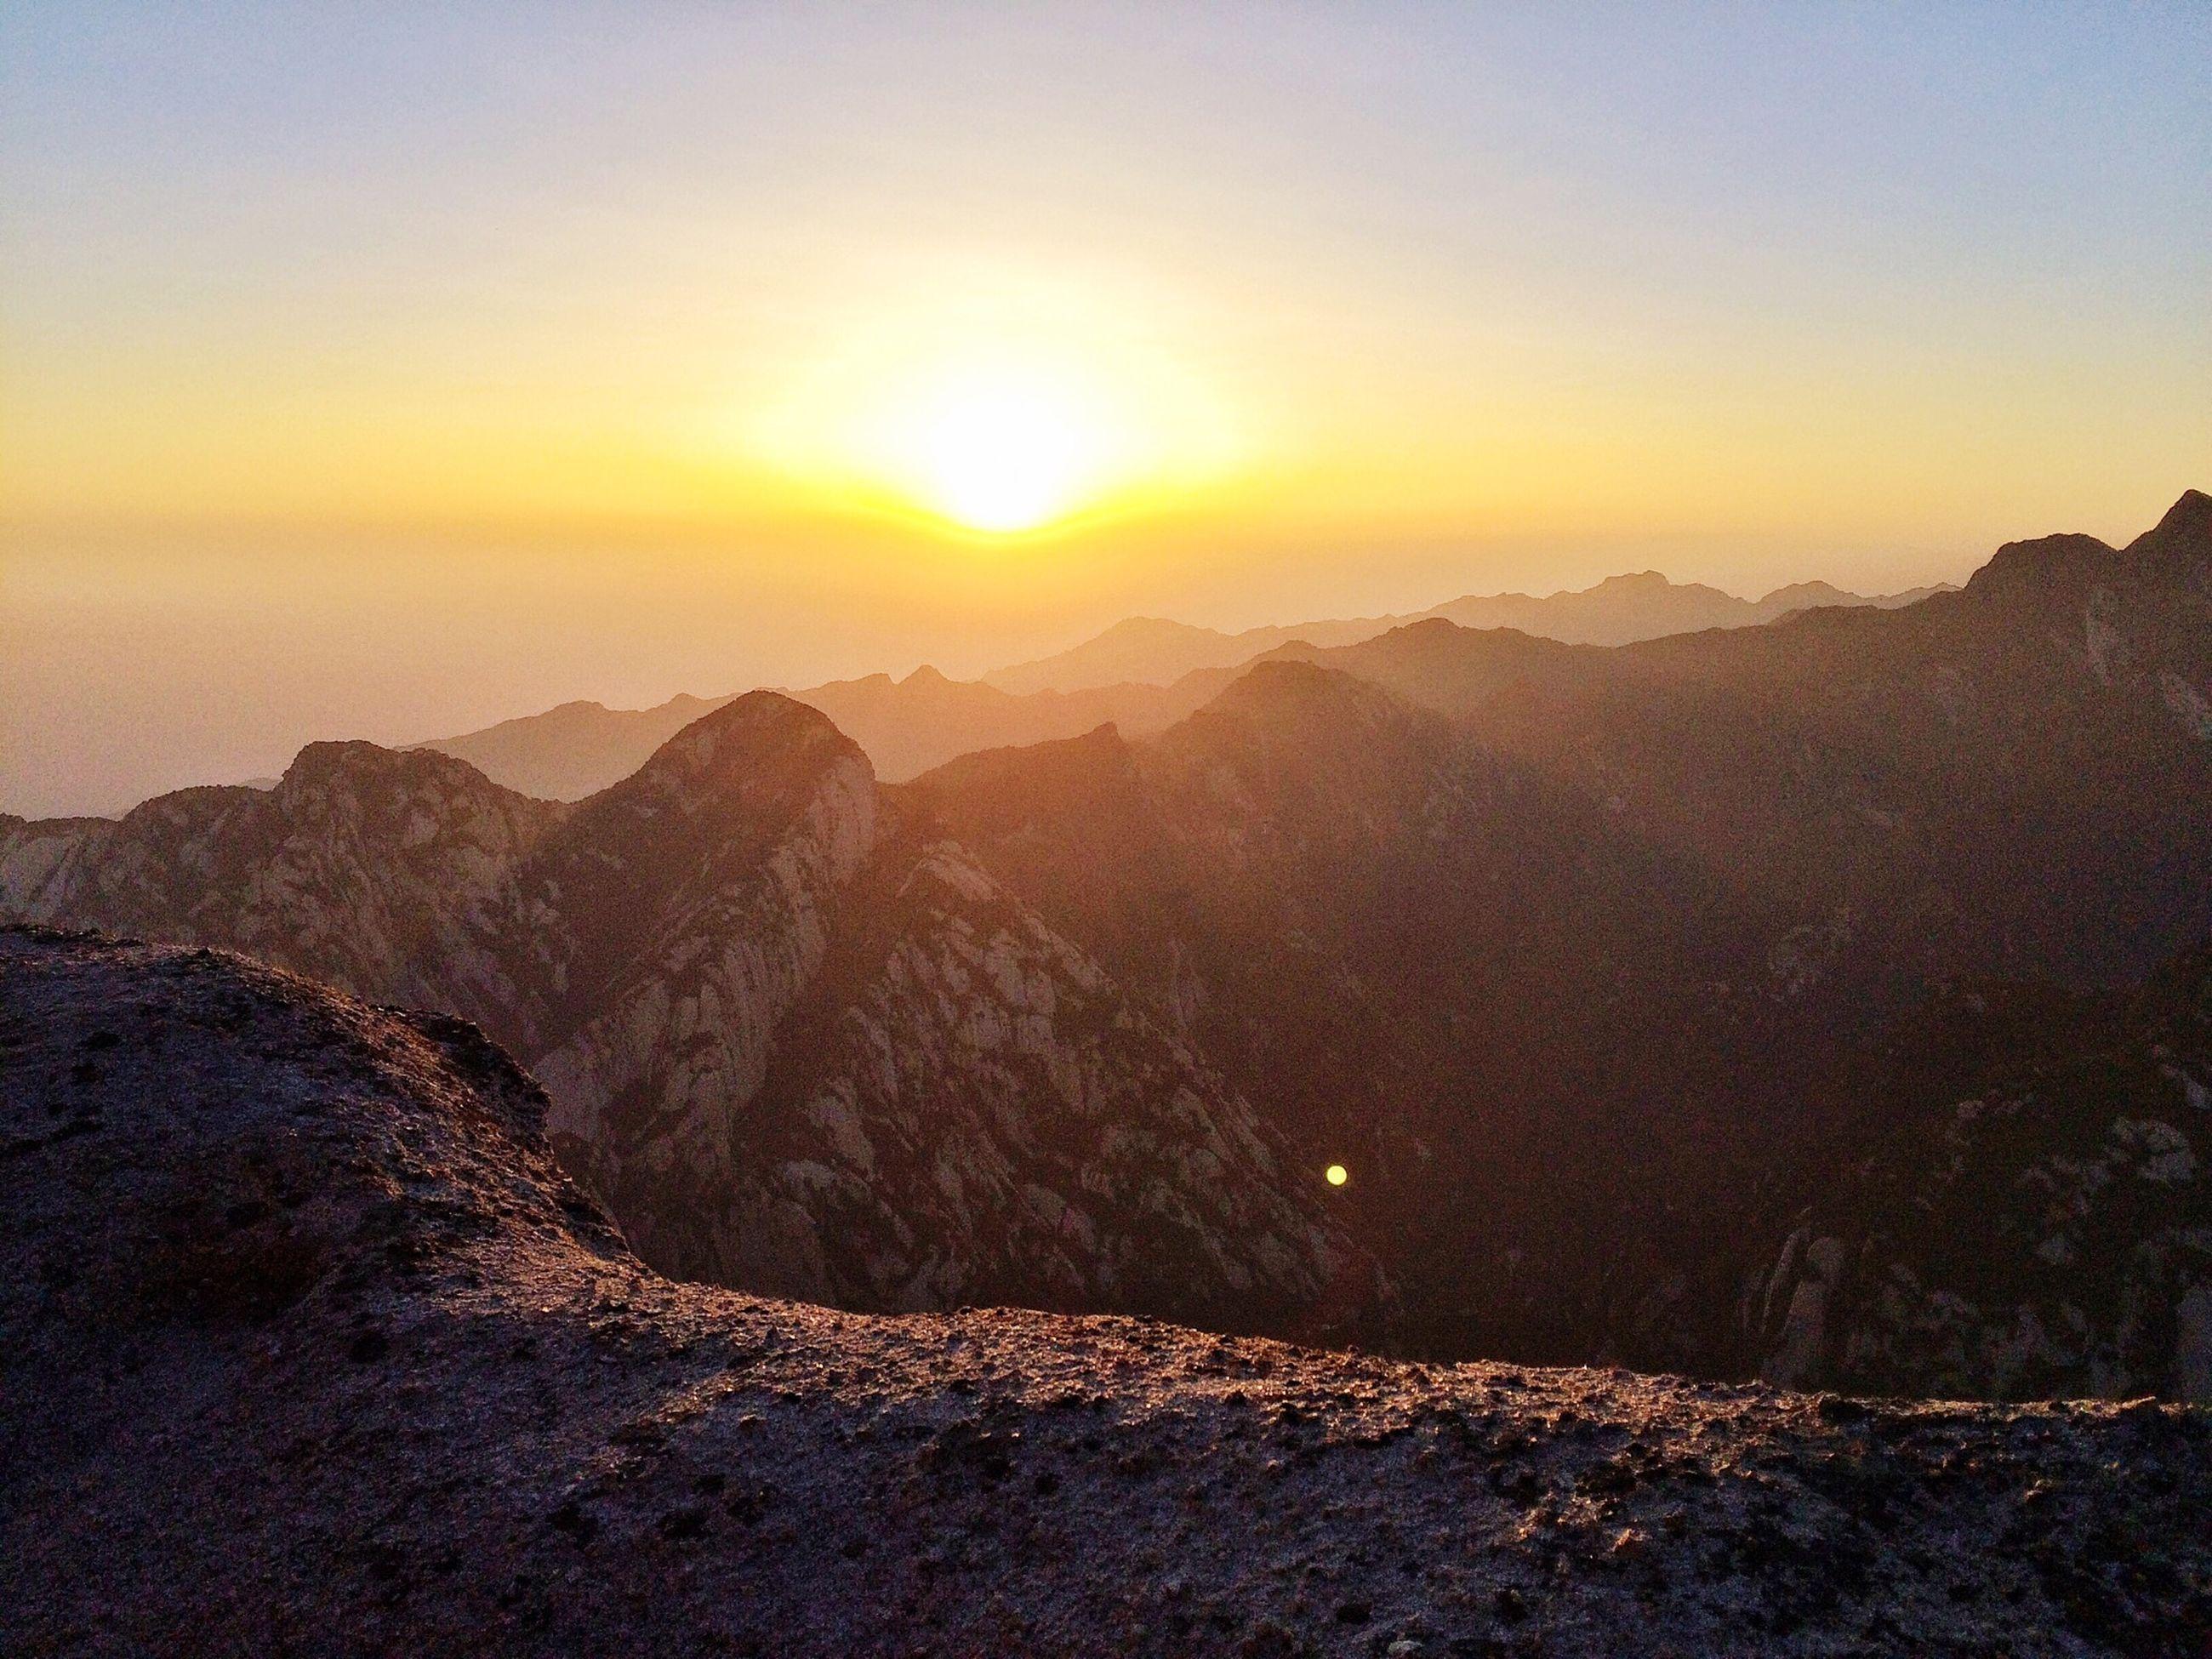 sunset, sun, scenics, tranquil scene, mountain, tranquility, beauty in nature, nature, sunlight, mountain range, idyllic, sky, landscape, sunbeam, non-urban scene, water, orange color, lens flare, majestic, remote